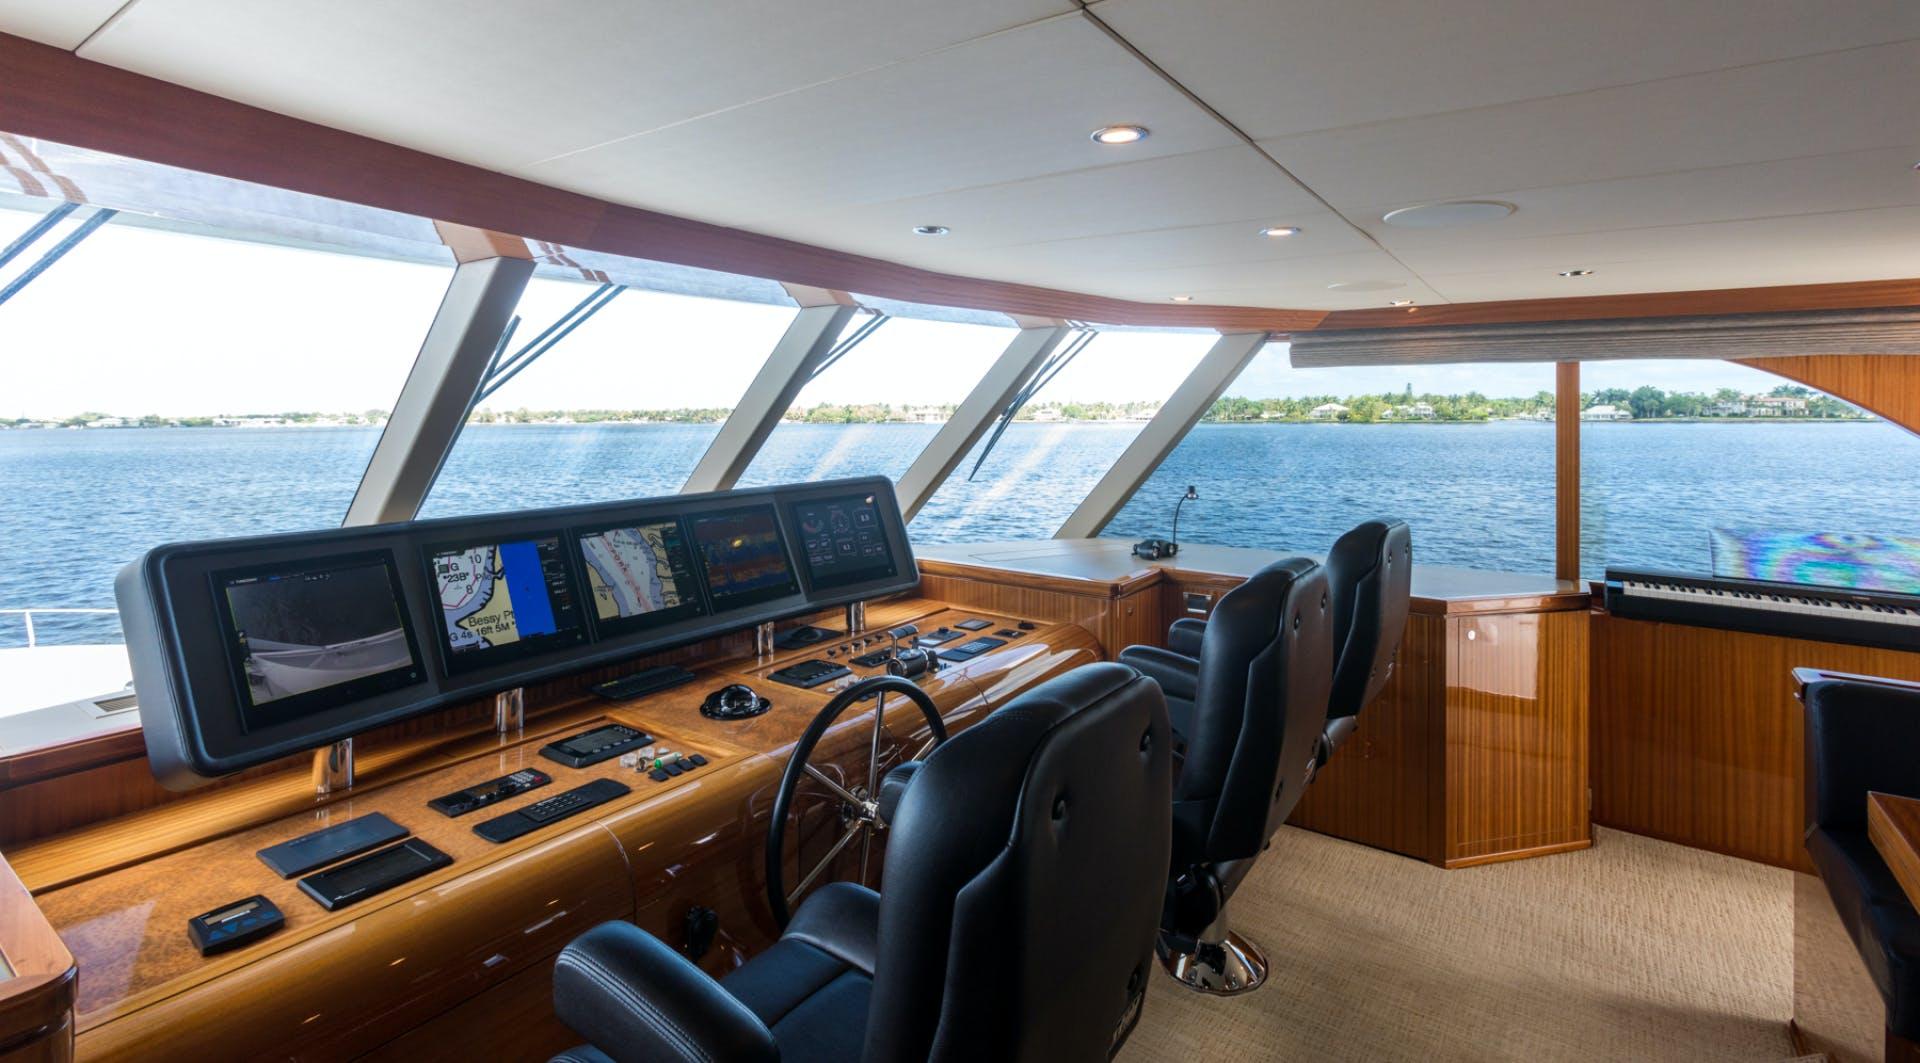 2014 Ocean Alexander 78' 78 Enclosed Bridge ANN LOUISE | Picture 2 of 39